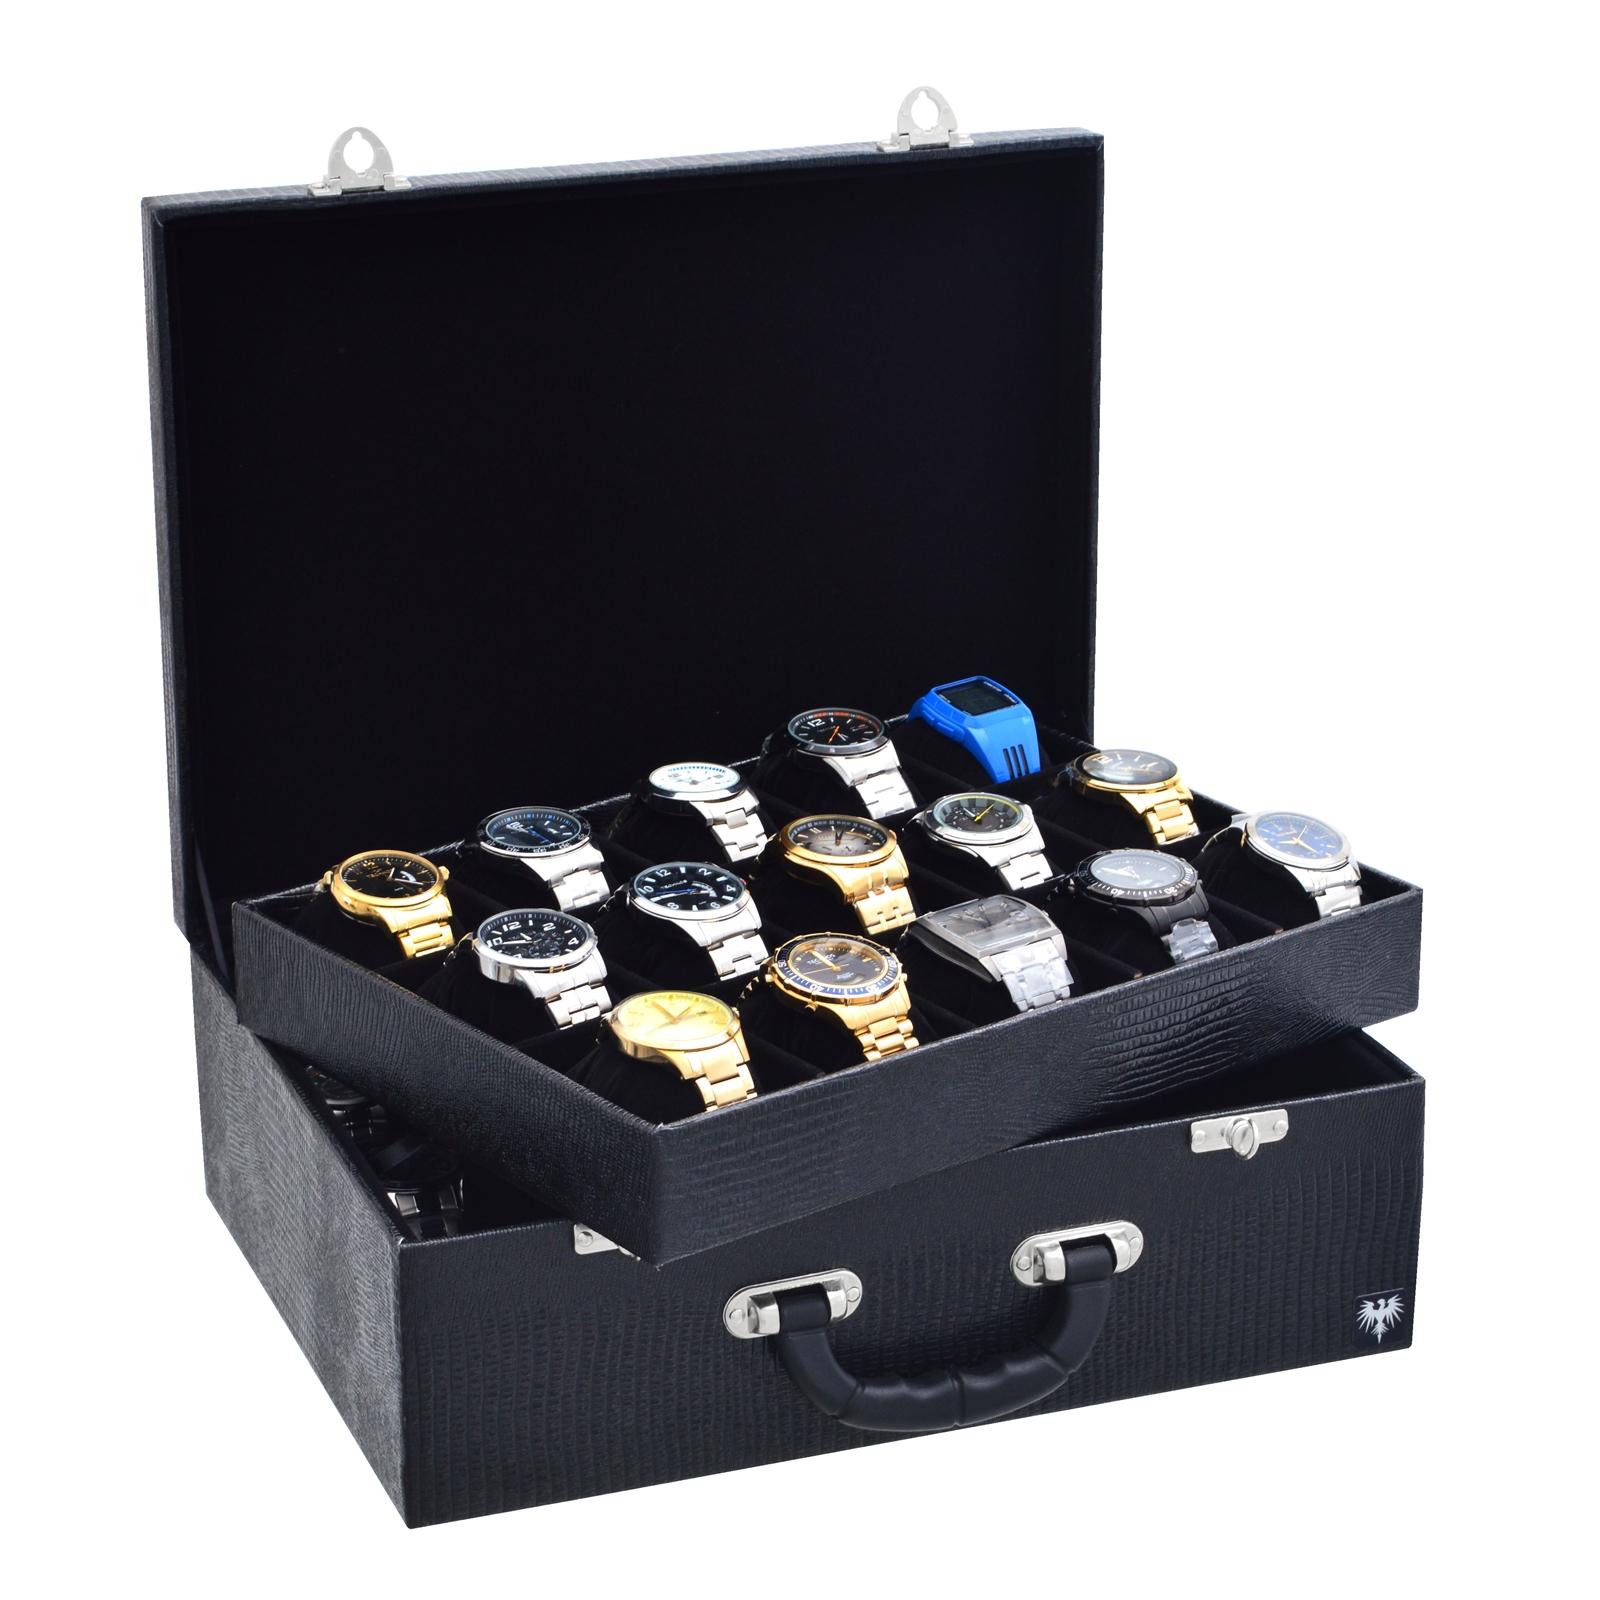 maleta-porta-relogio-30-nichos-couro-ecologico-preto-preto-imagem-1.JPG